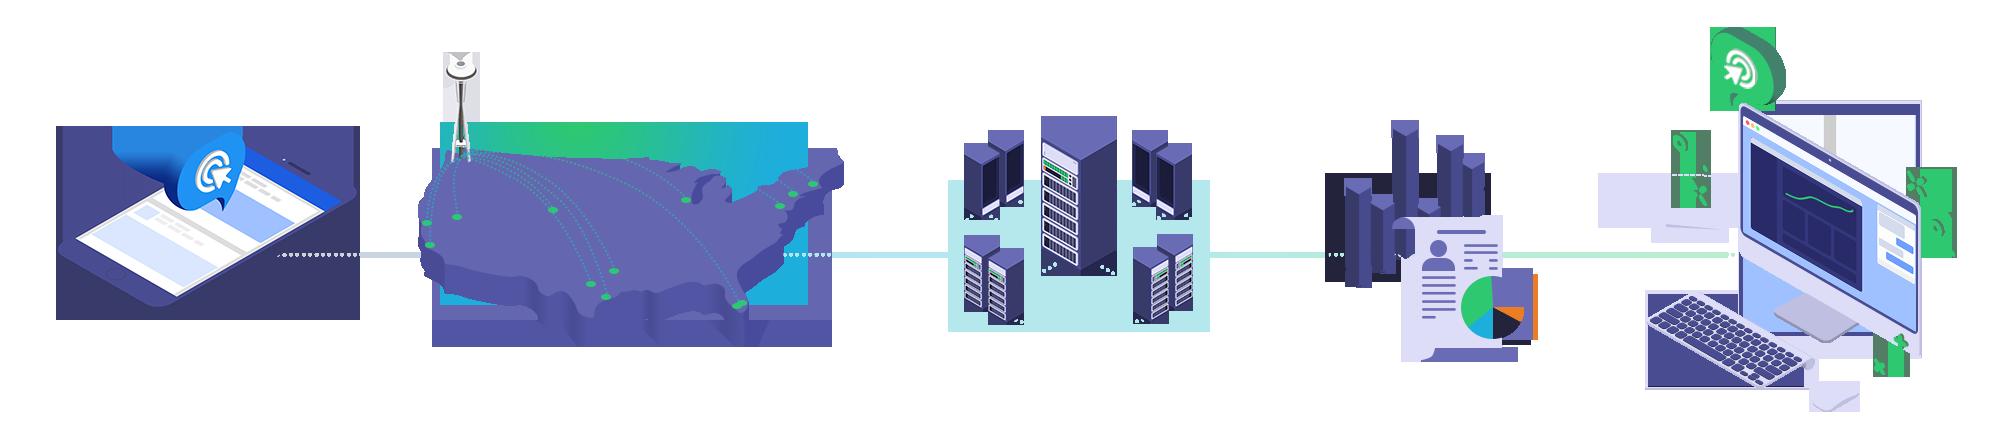 Gratafy Data Storage